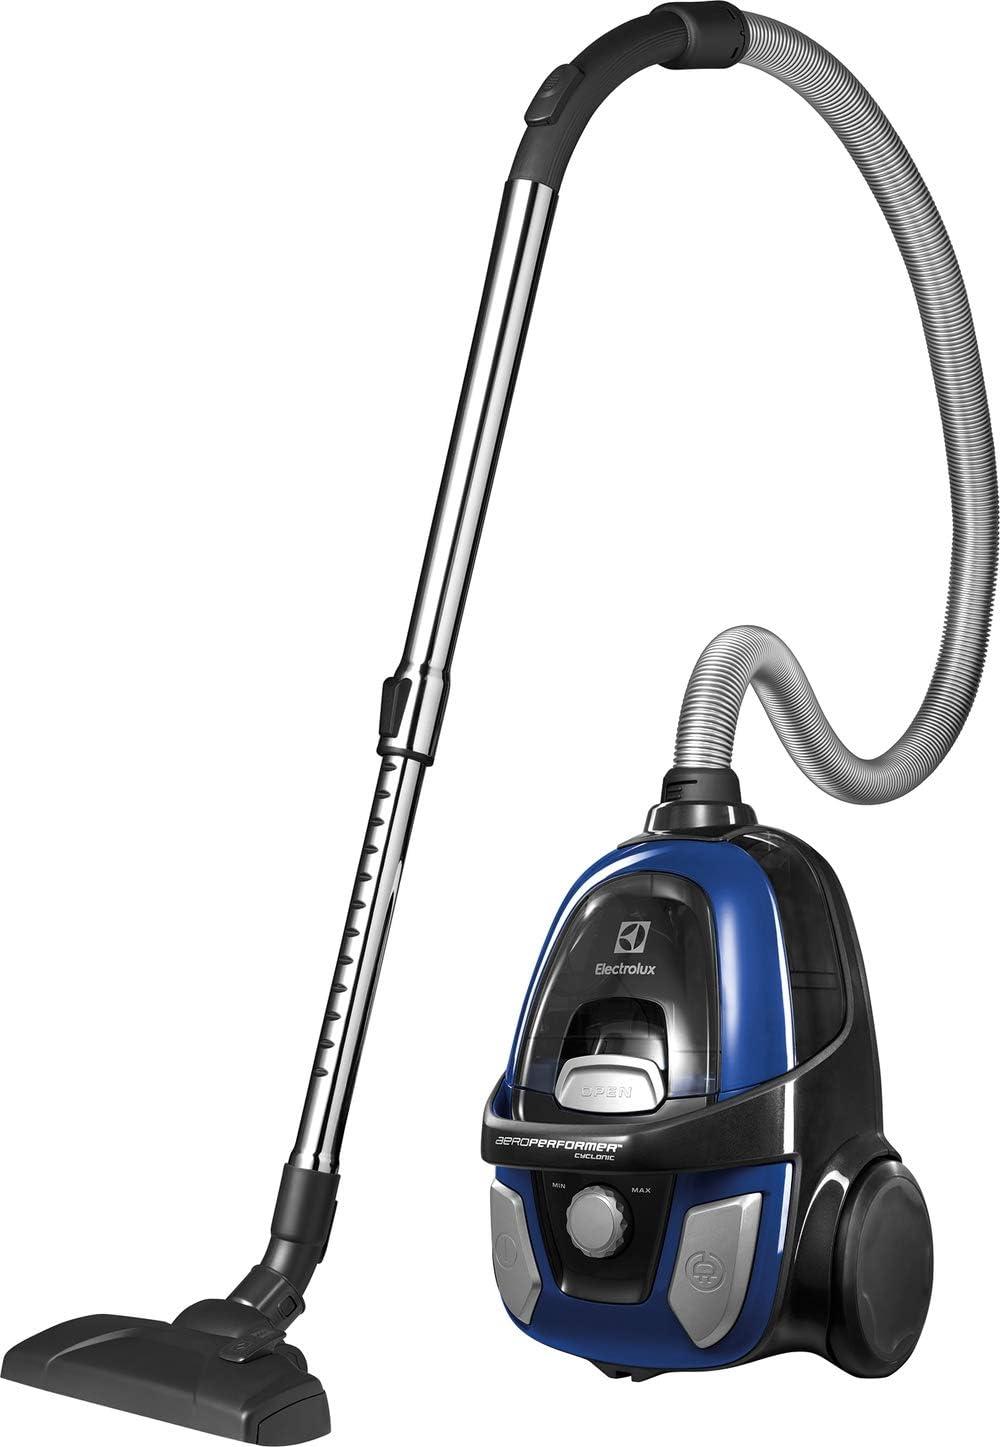 Electrolux EAPC53IS 650 W - Aspiradora (650 W, 26,5 kWh, Aspiradora de tambor, Sin bolsa, Azul, Filtro higiénico): Amazon.es: Hogar